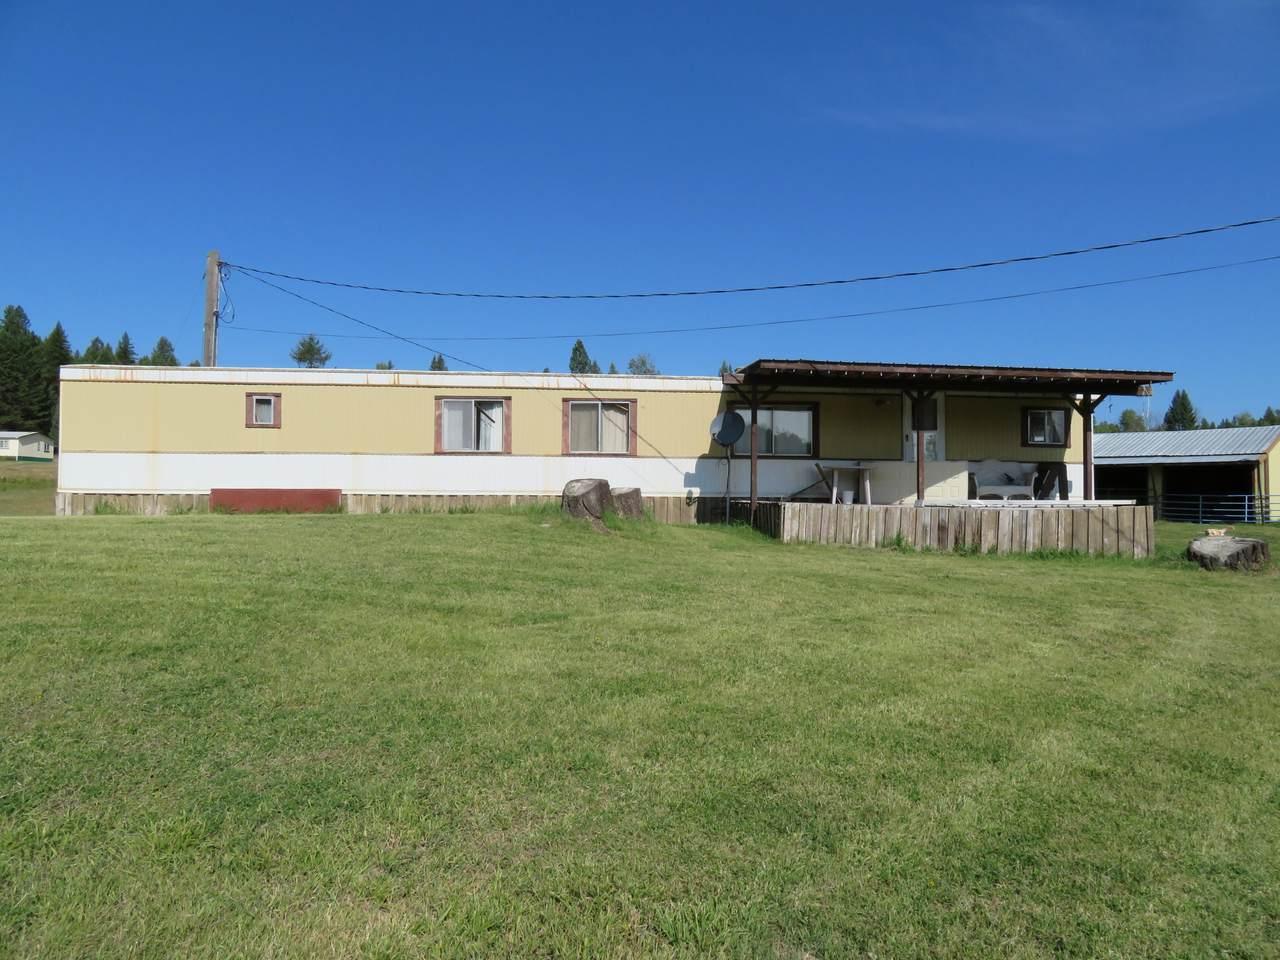 735 Trout Creek Rd - Photo 1